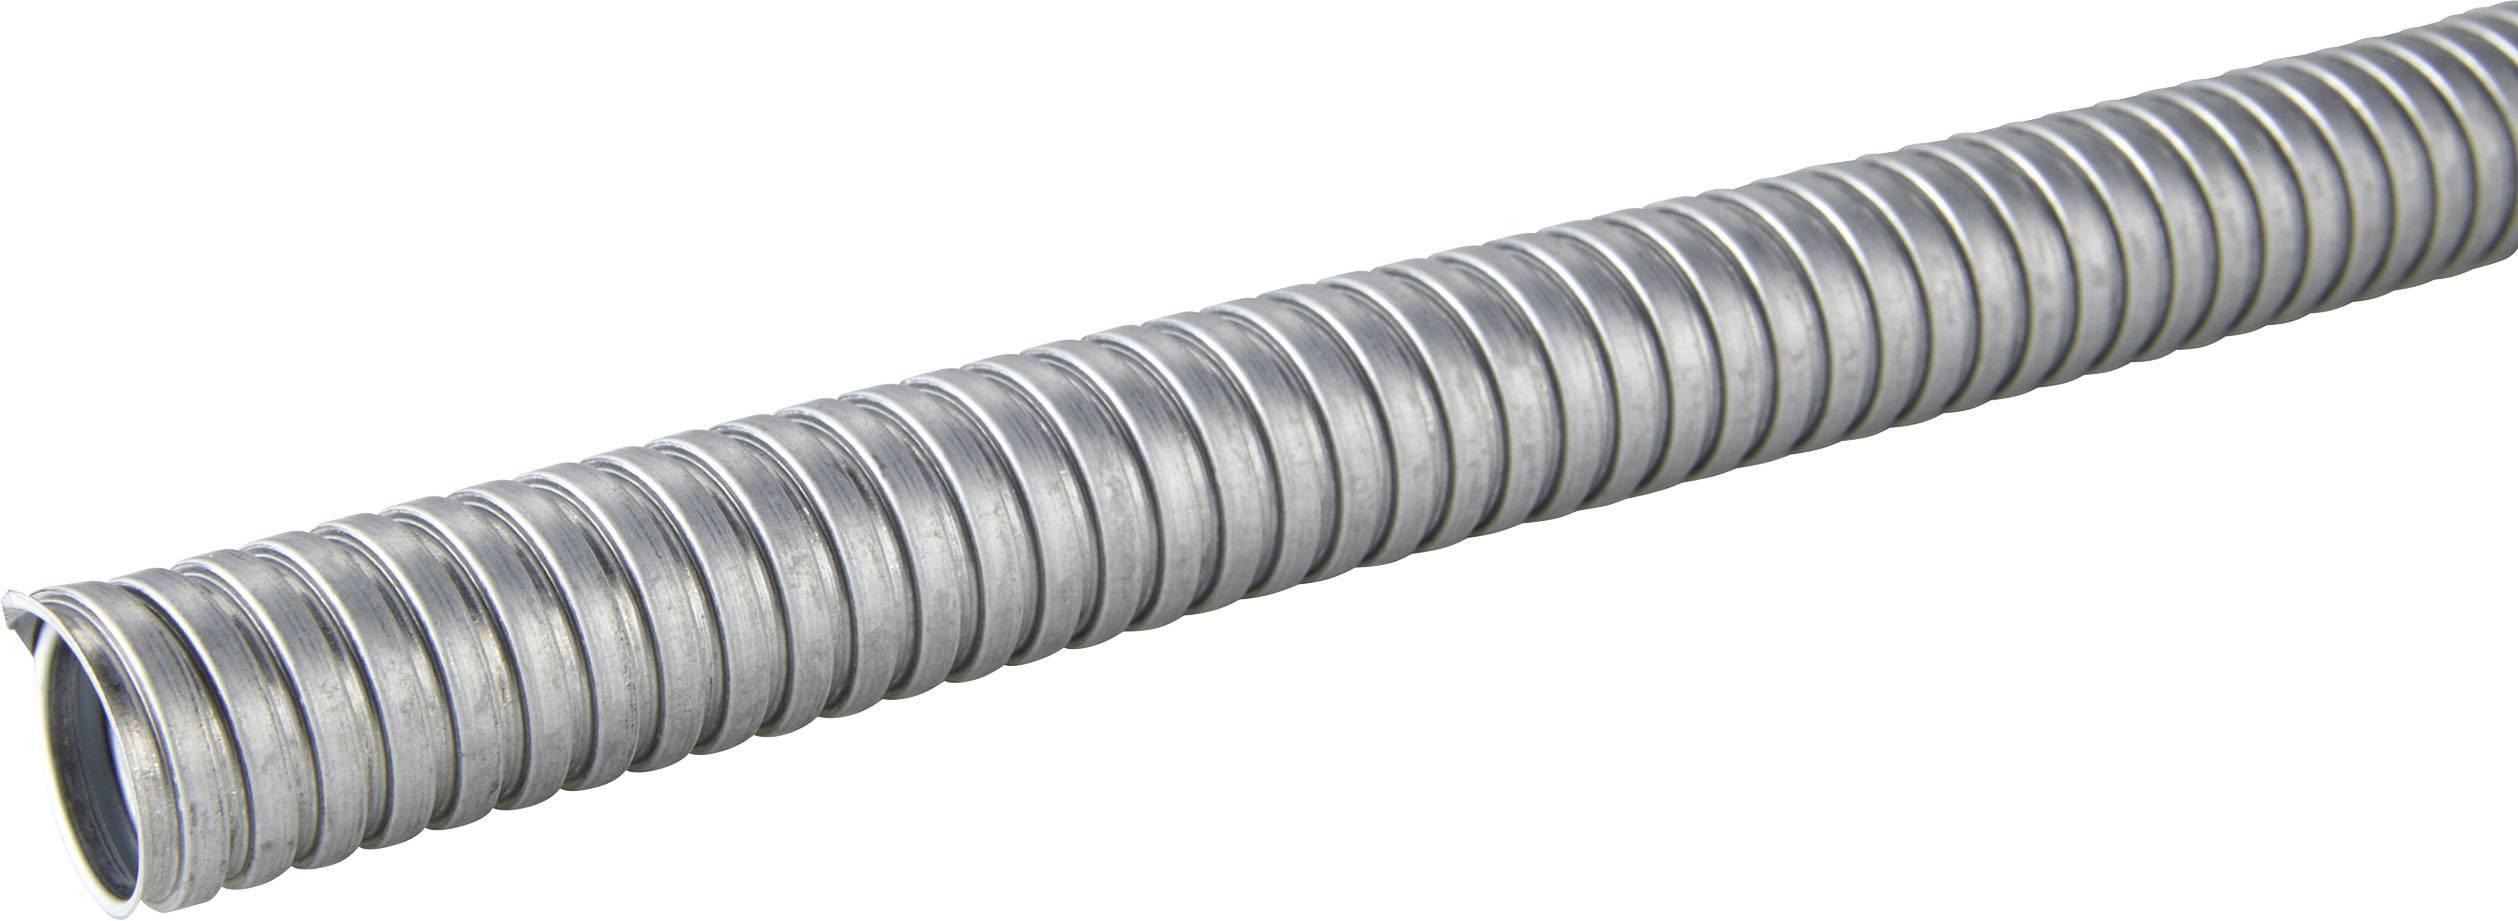 Ochranná hadice na kov LappKabel SILVYN® AS 7/8x10 61802080, stříbrná, 50 m